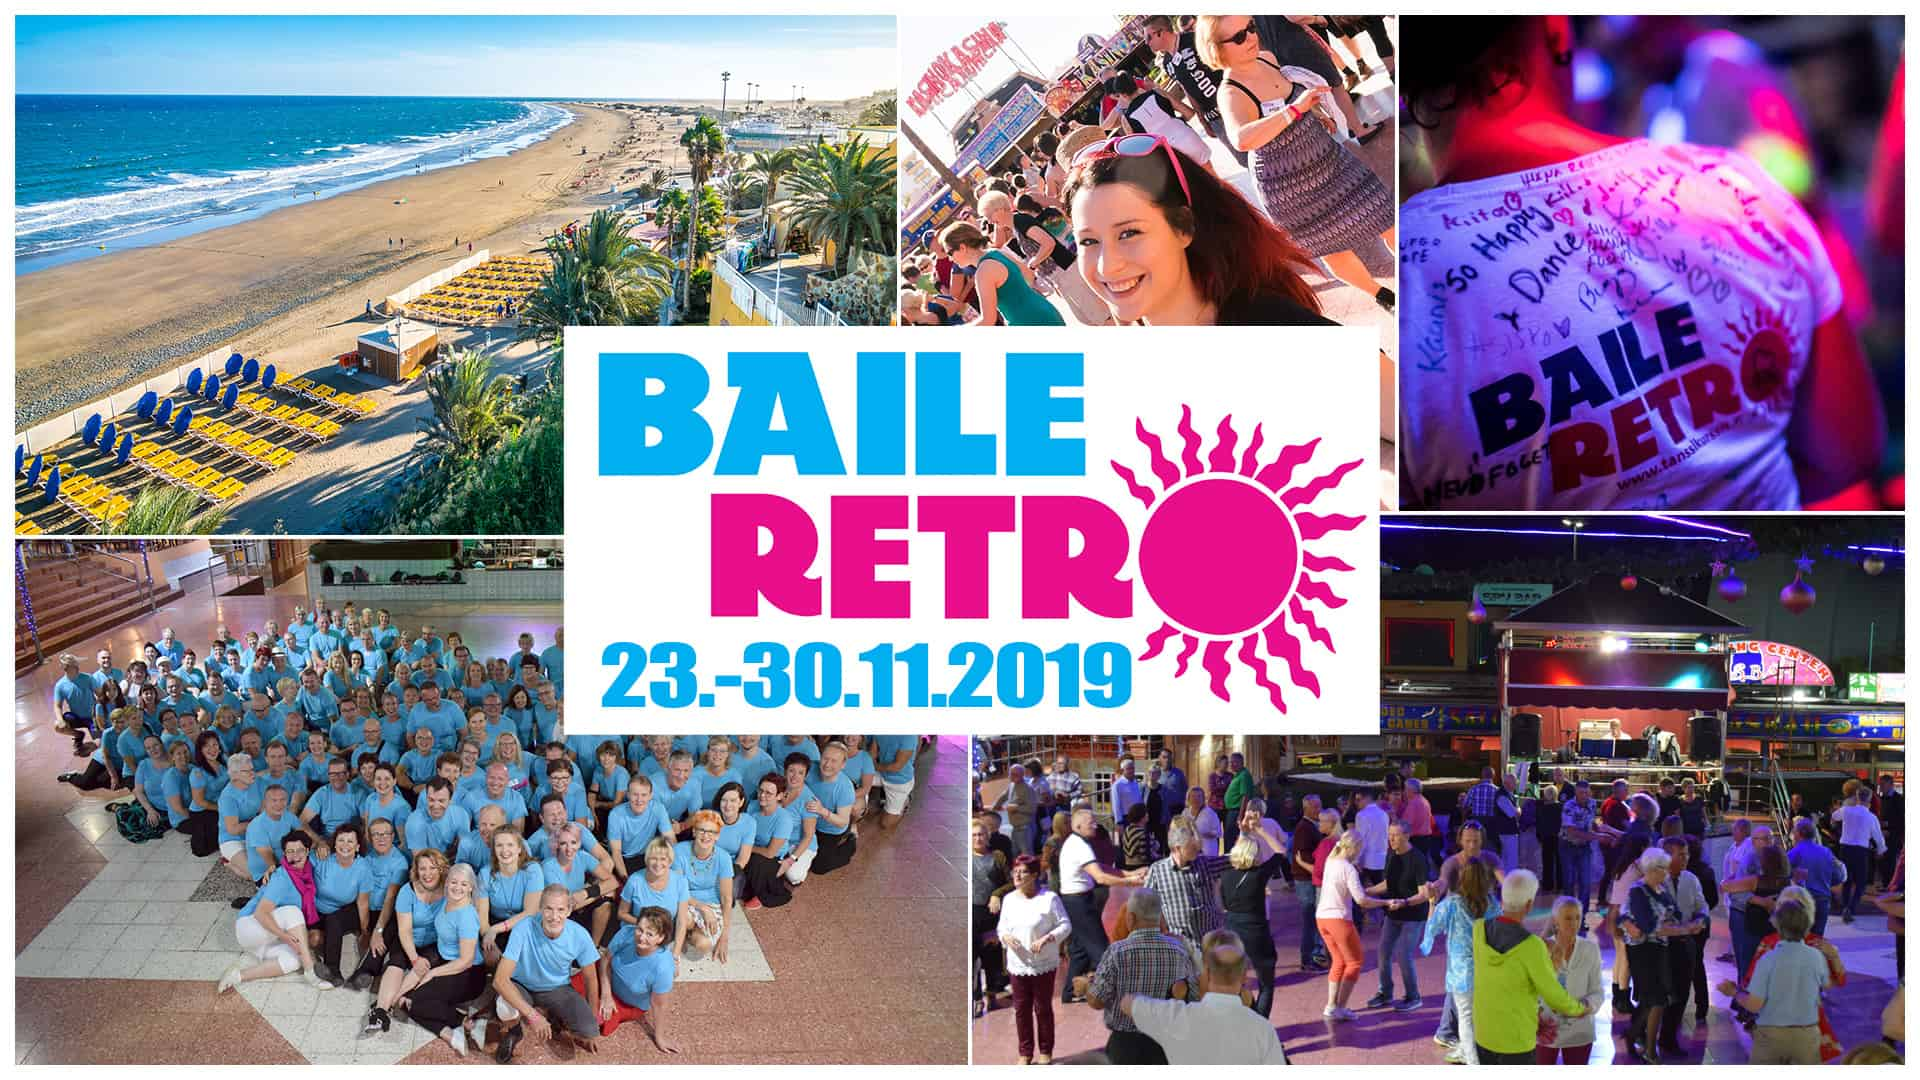 Baile Retro 23.-30.11.2019 Playa del ingles, Tanssimatka kanarialle